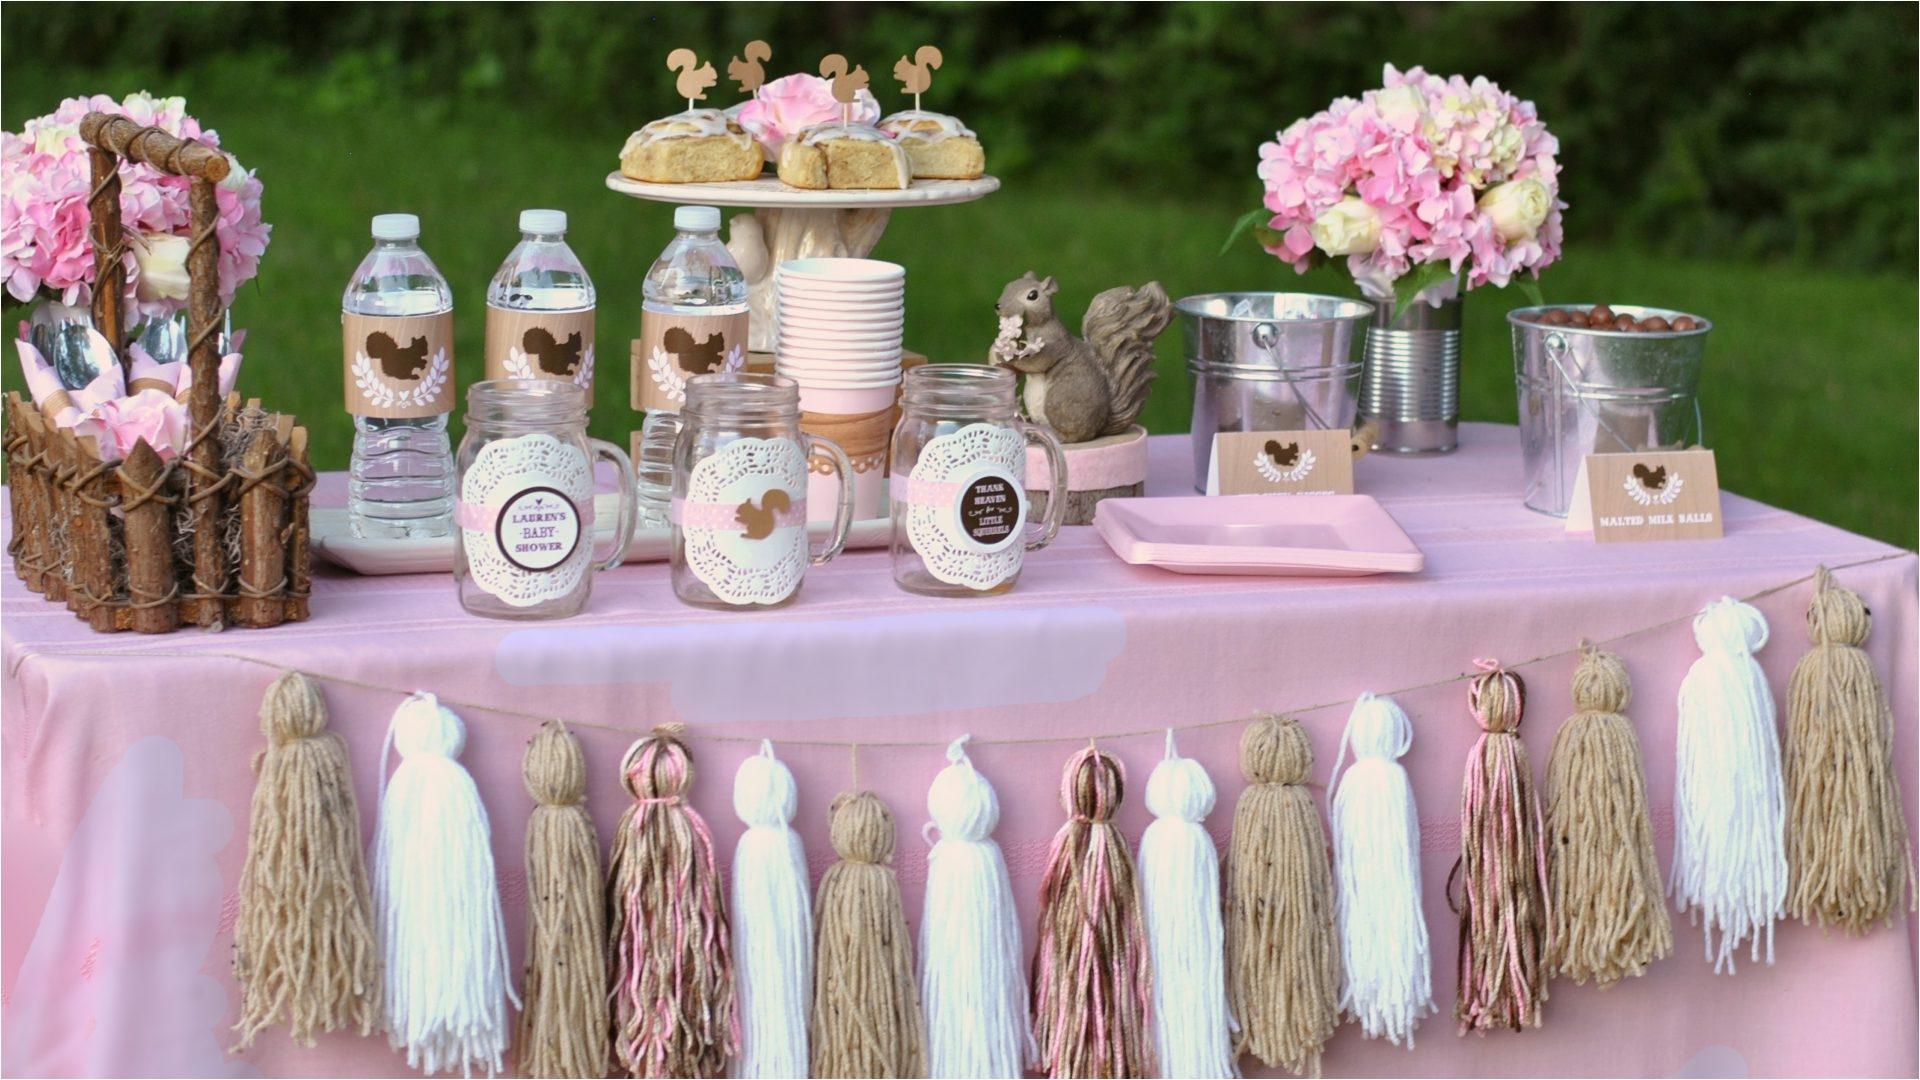 Baby Shower Decorations For Girl Diy Elegant Girl Baby Shower